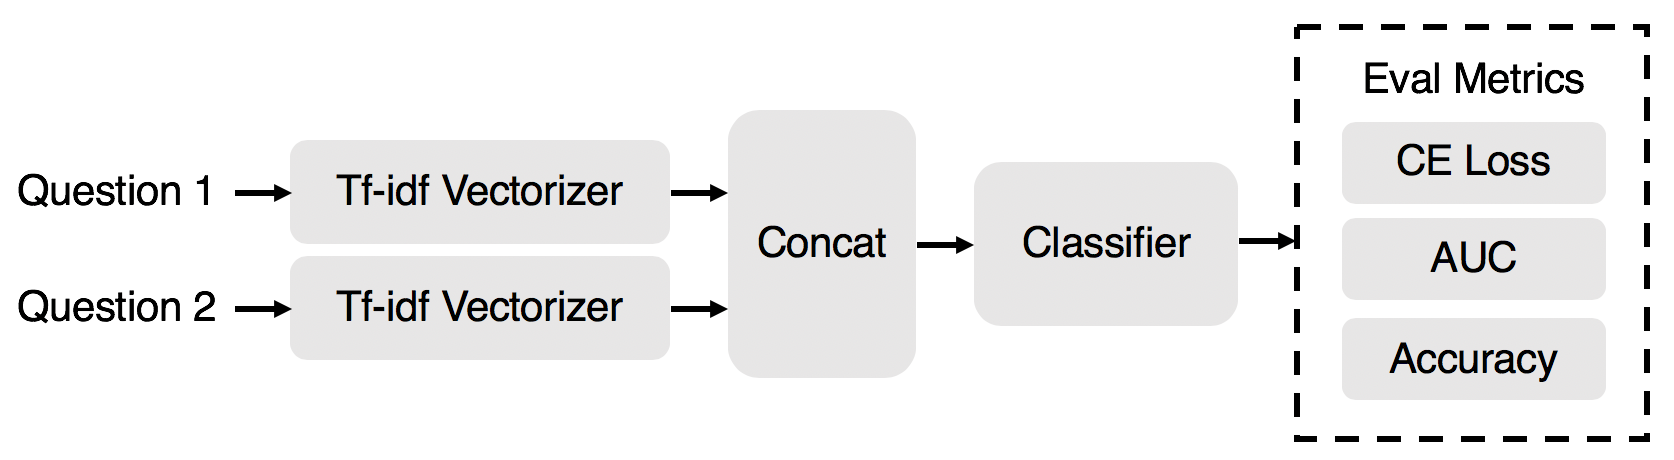 GitHub - aspk/Quora_question_pairs_NLP_Kaggle: Quora Kaggle